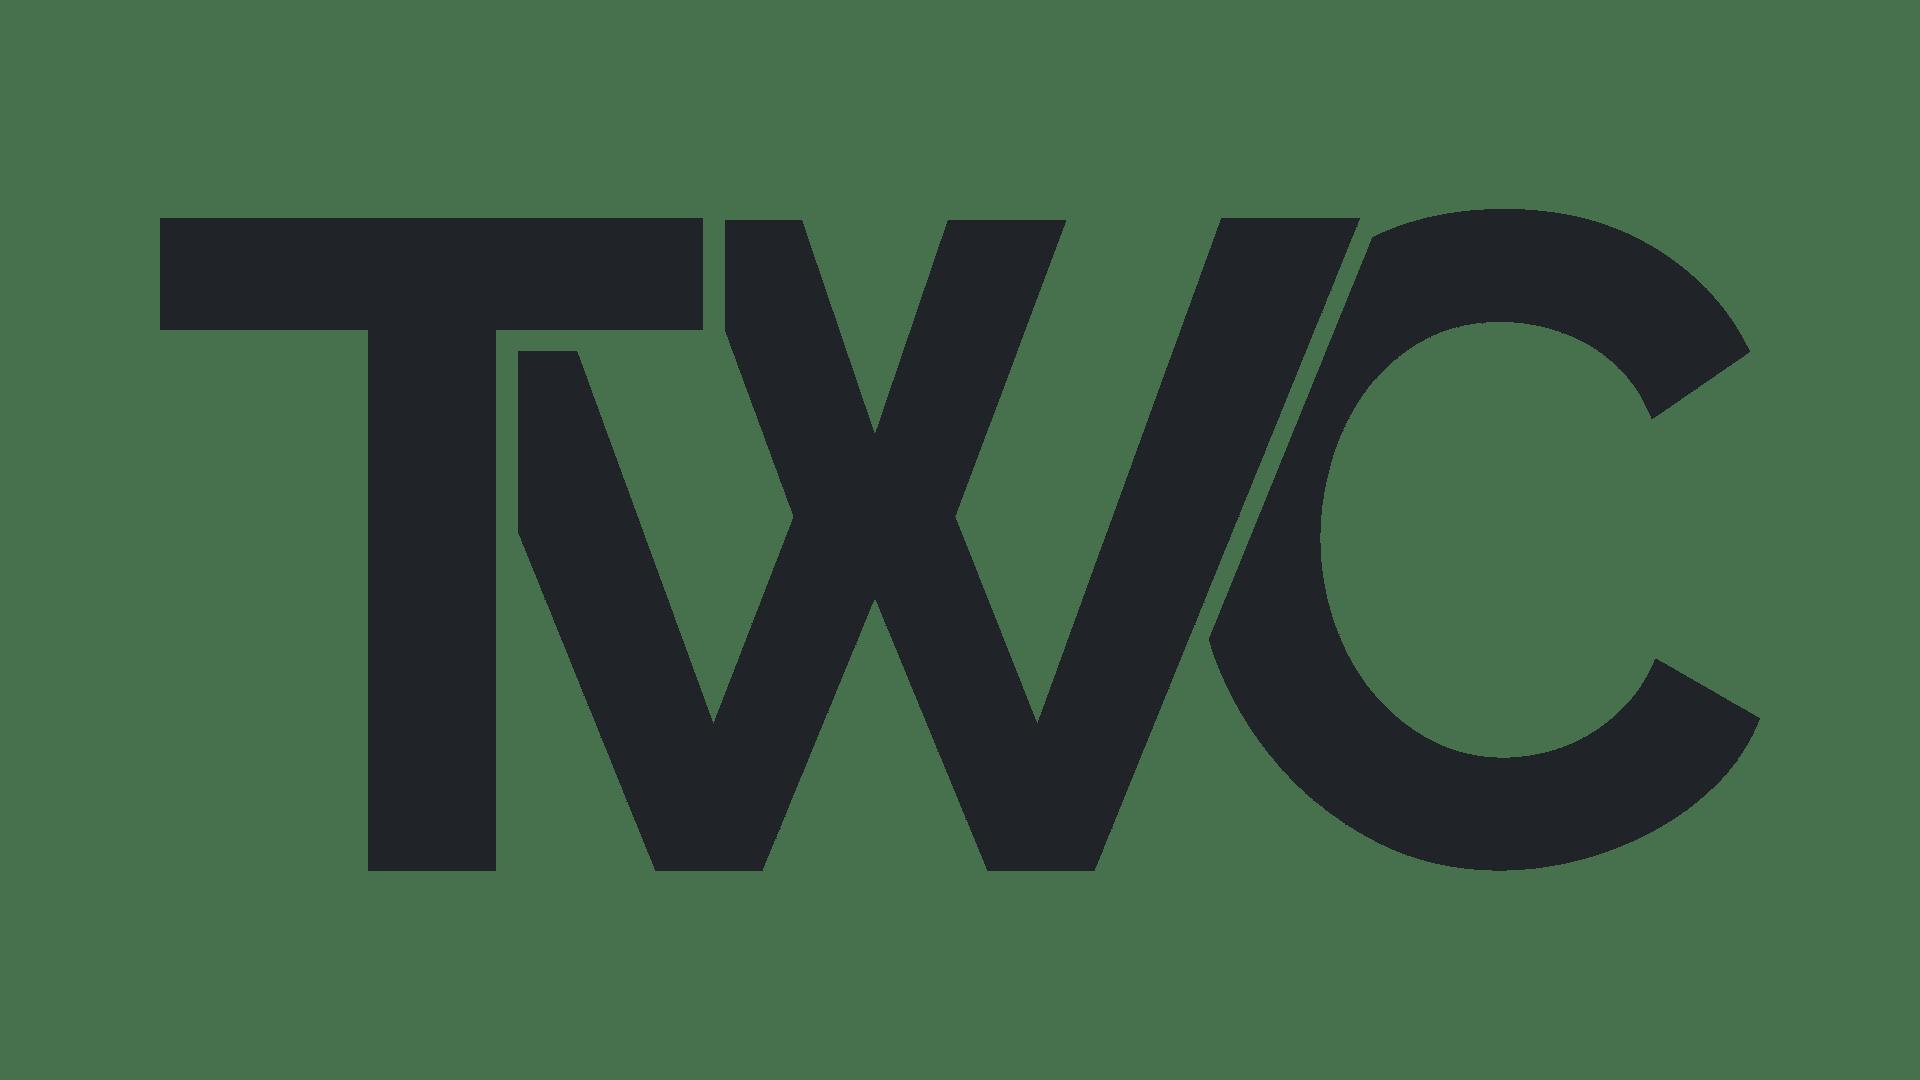 Thomas Web Création